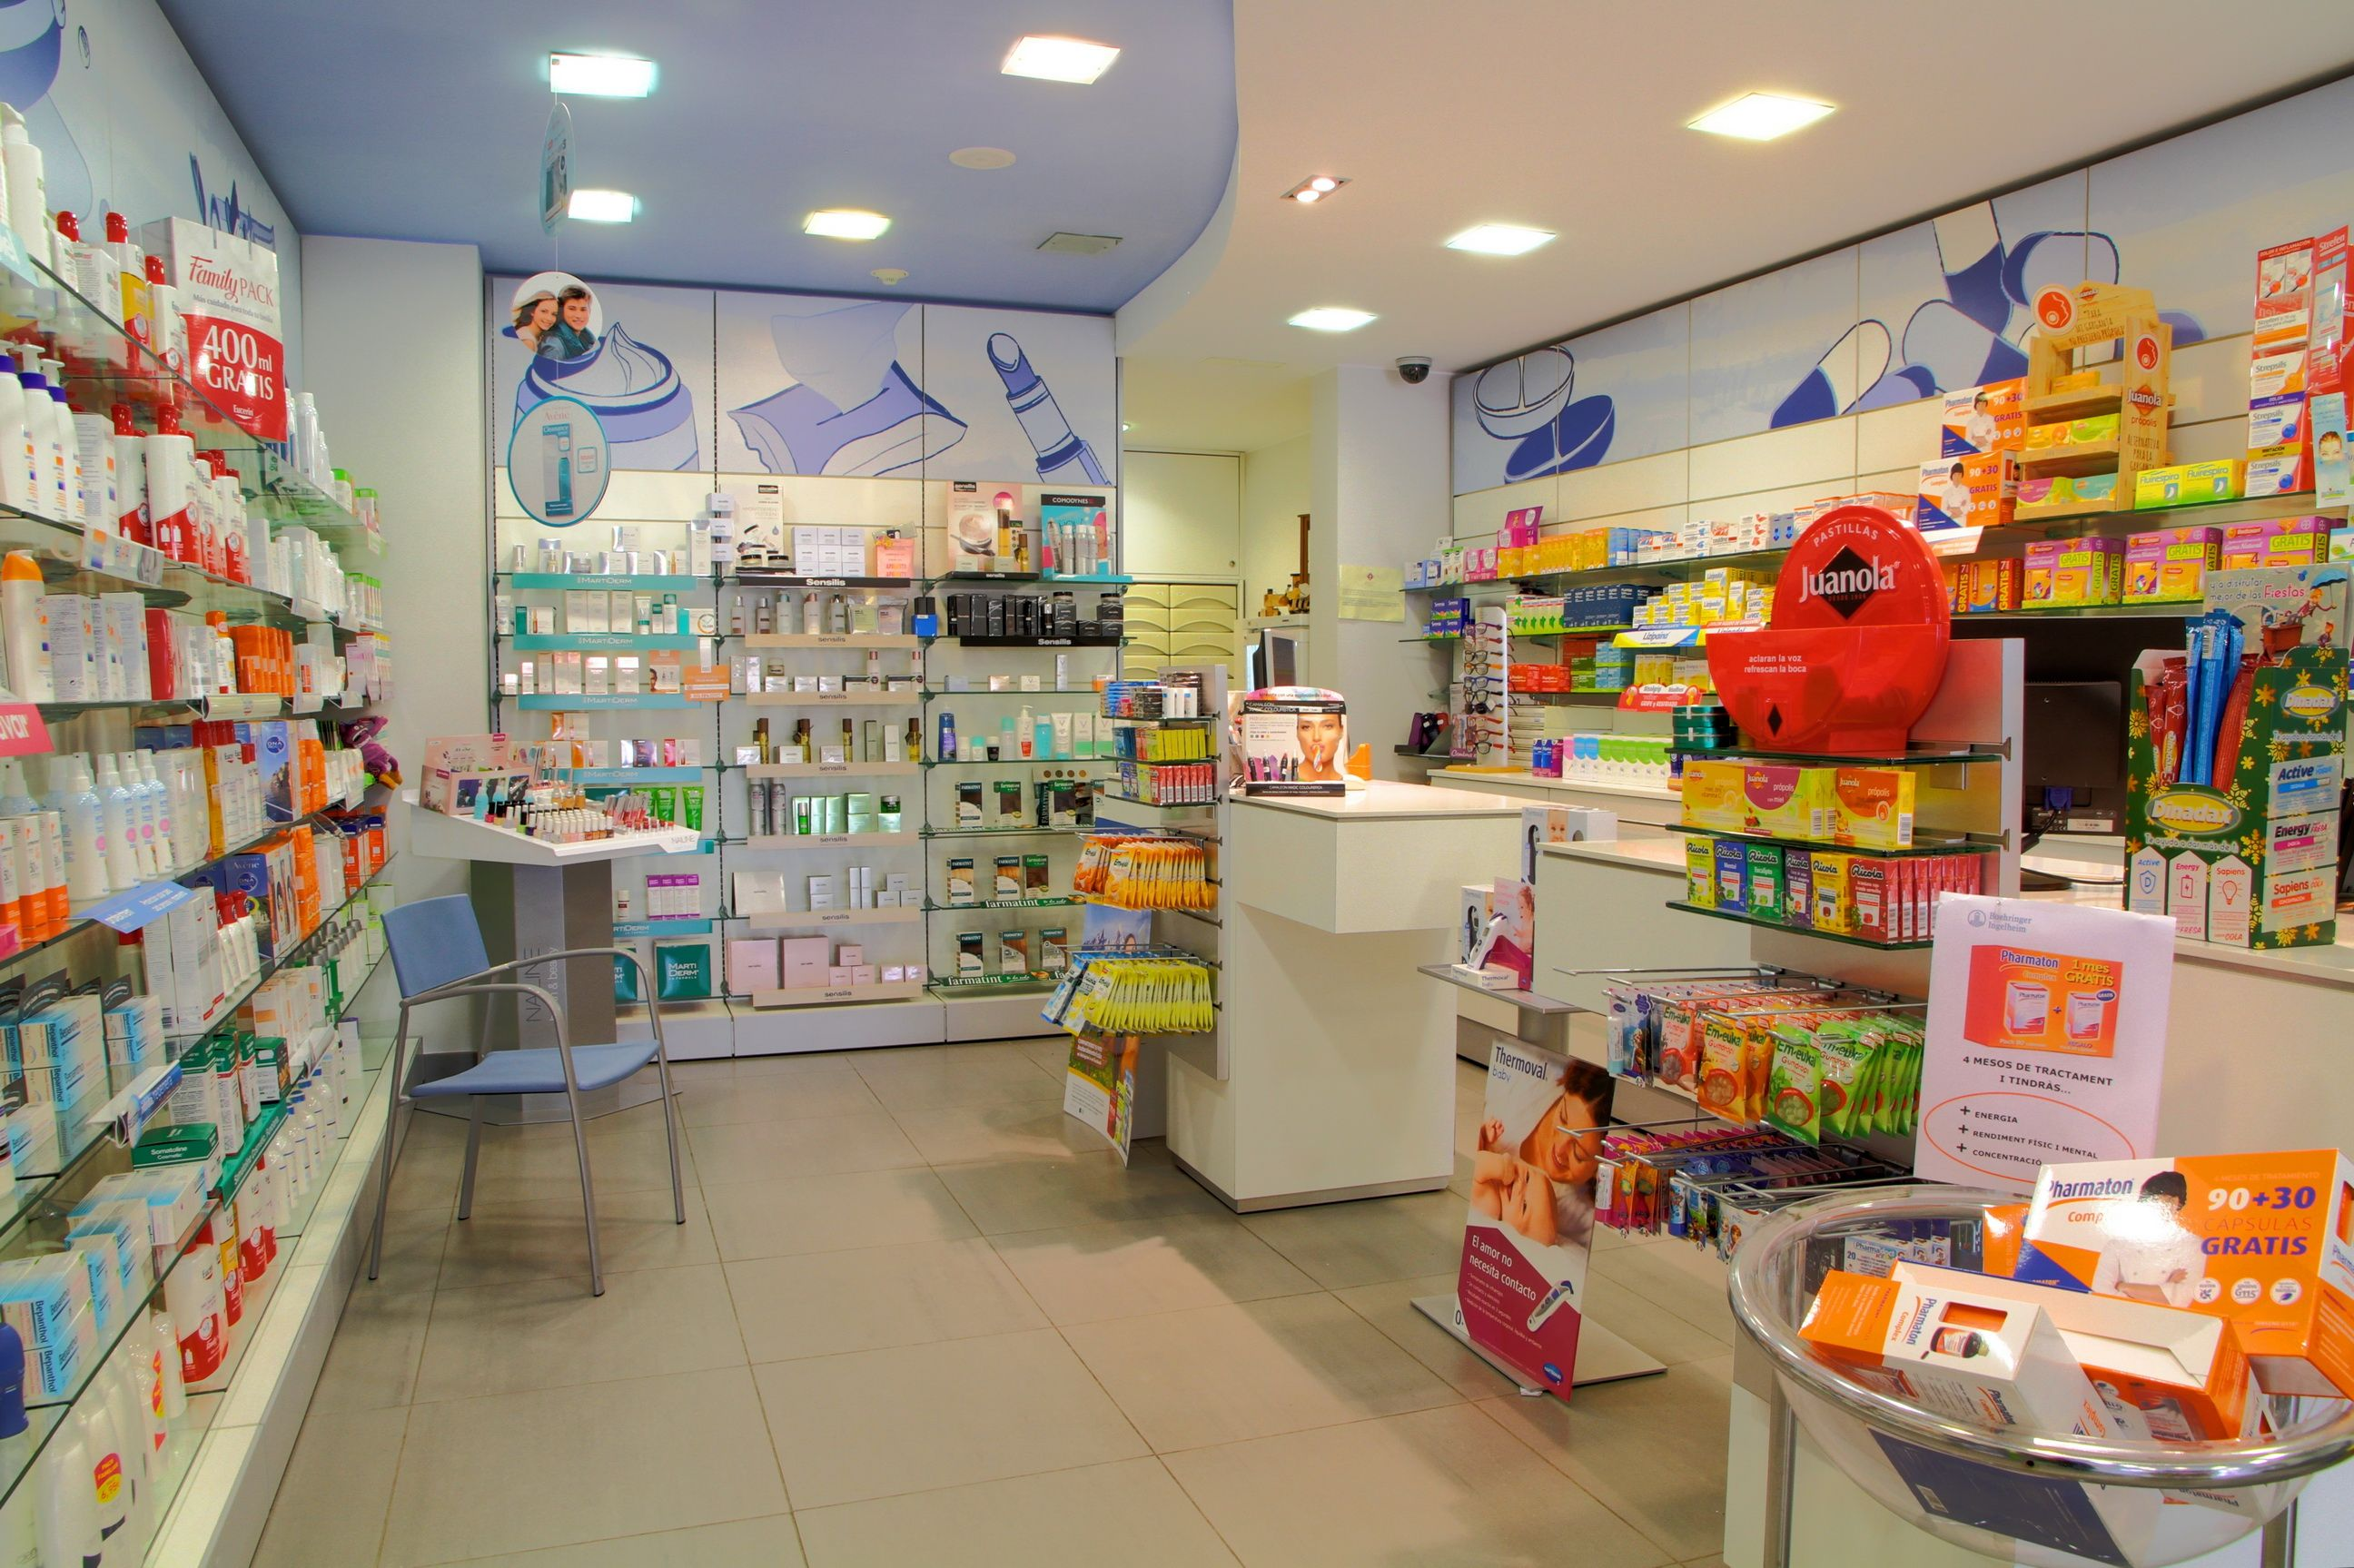 Foto 4 de Farmacia en Guissona | Farmacia Rosa Cinca